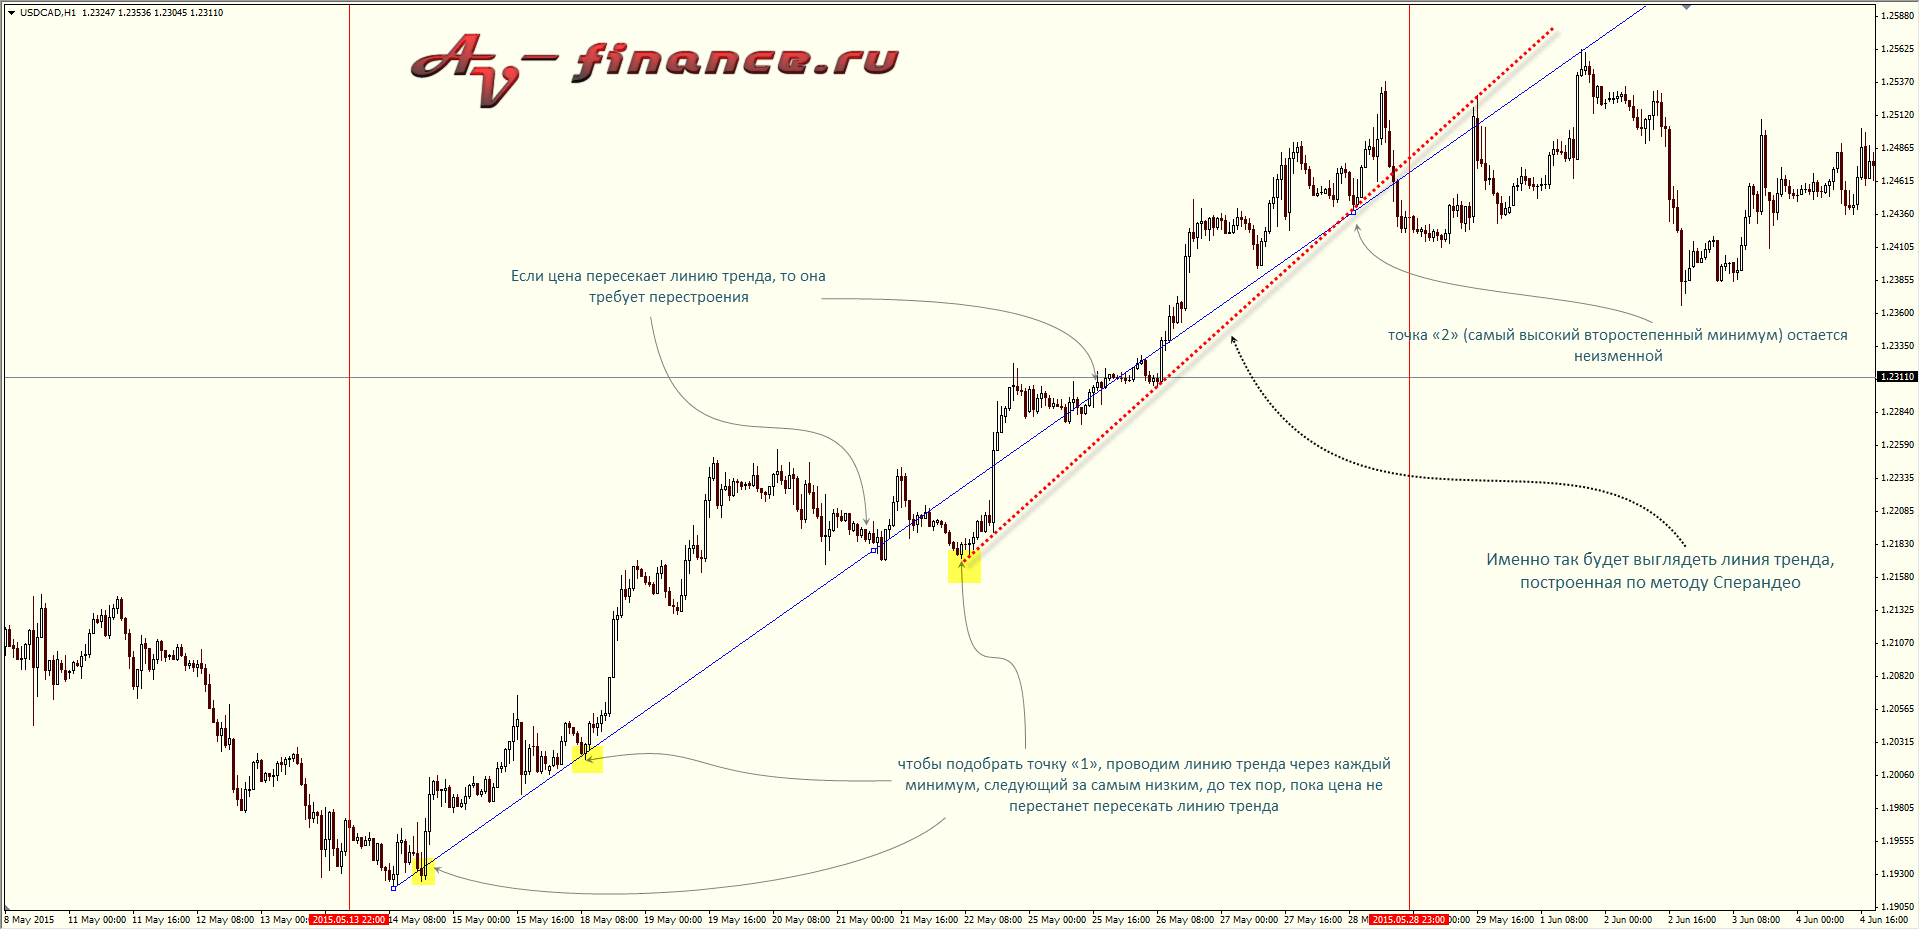 algoritm-postroenija-linij-trenda-metodu-sperandeo-2 Фигуры разворота и продолжения тренда